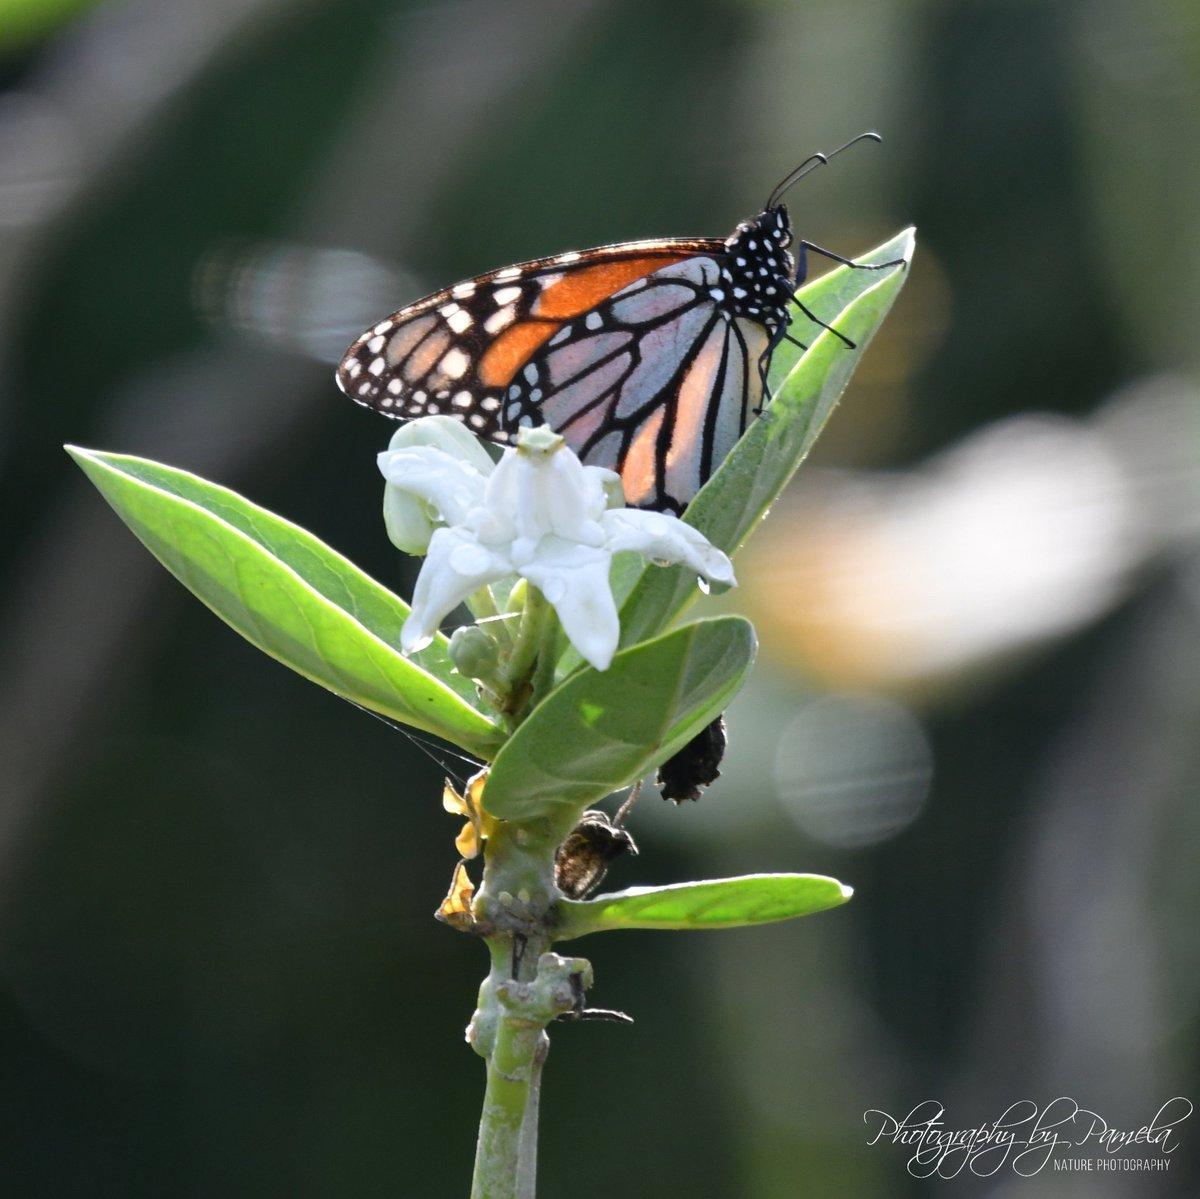 Butterfly #photographybypamela808 #butterfly #flowers #monarch #plants #nature #naturephotography #ilovebutterflies https://t.co/YLymdyWYAX